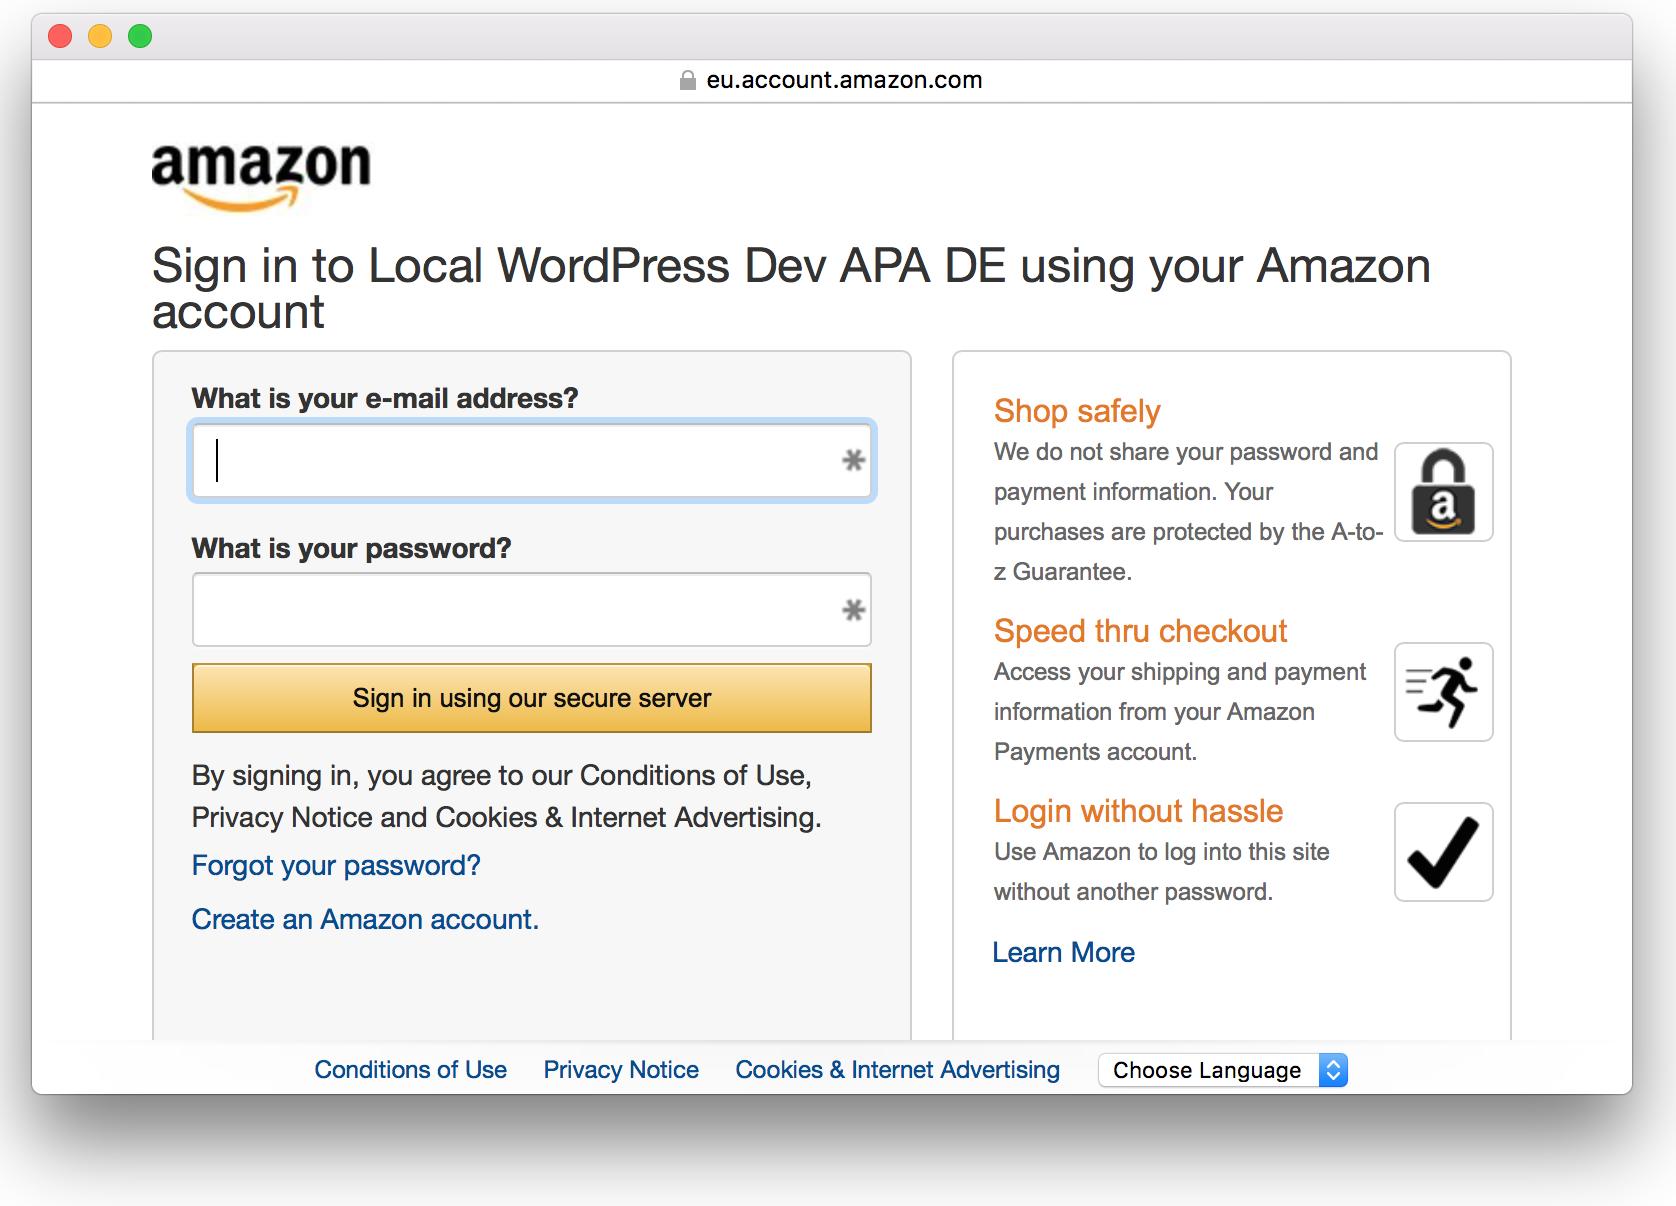 Bagaimana cara menggunakan AWS - Belajar Lebih Lanjut Mengenai Amazon Web Services